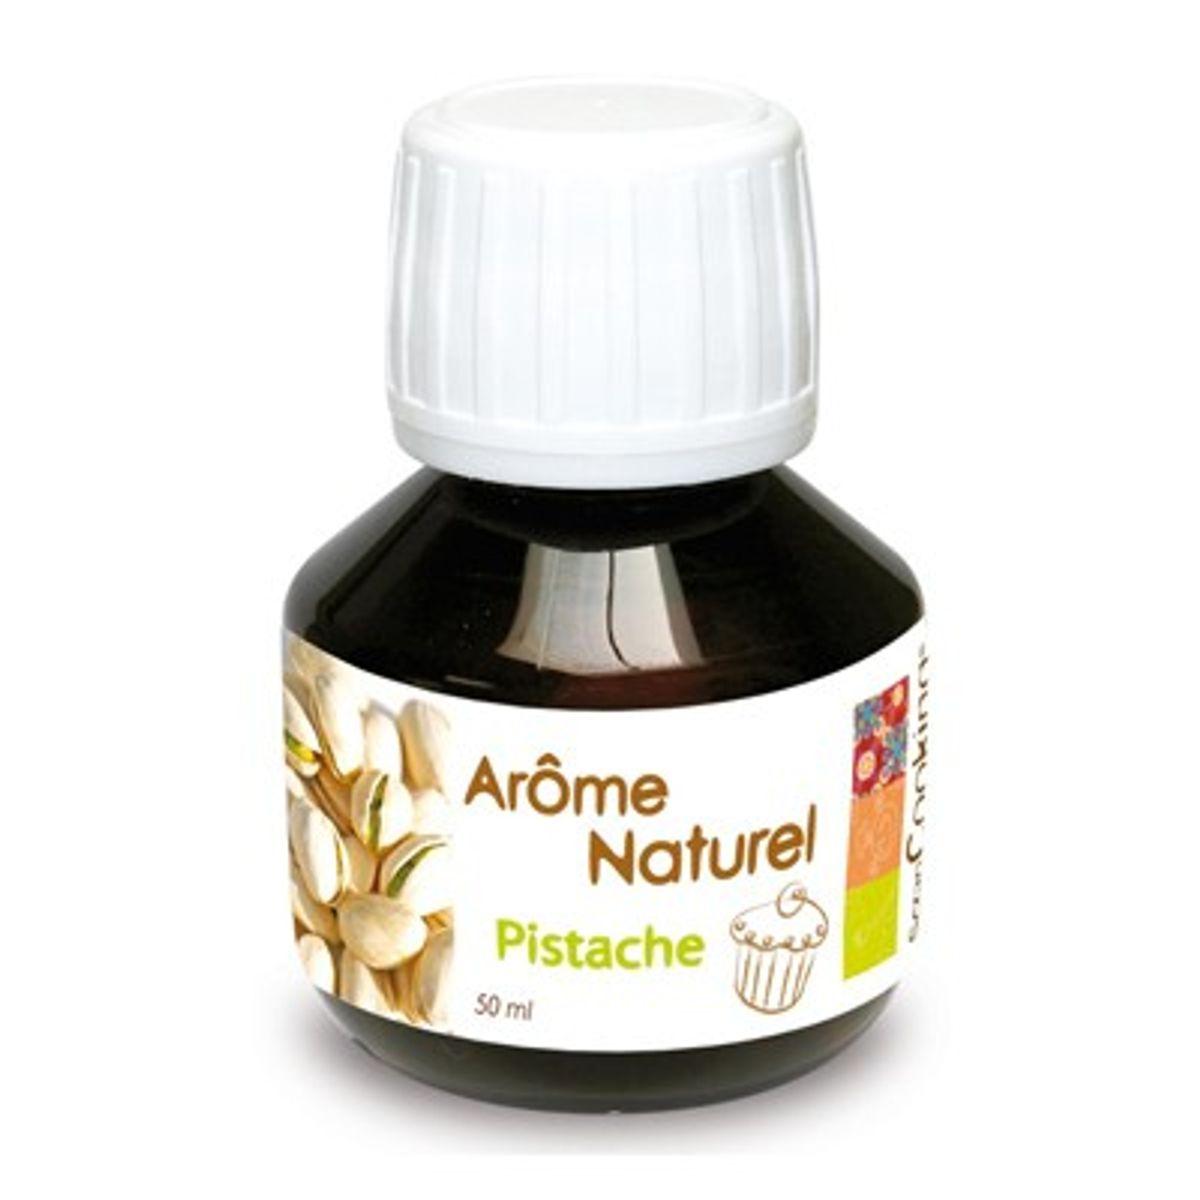 AROME NATUREL DE PISTACHE 50ML - SCRAPCOOKING